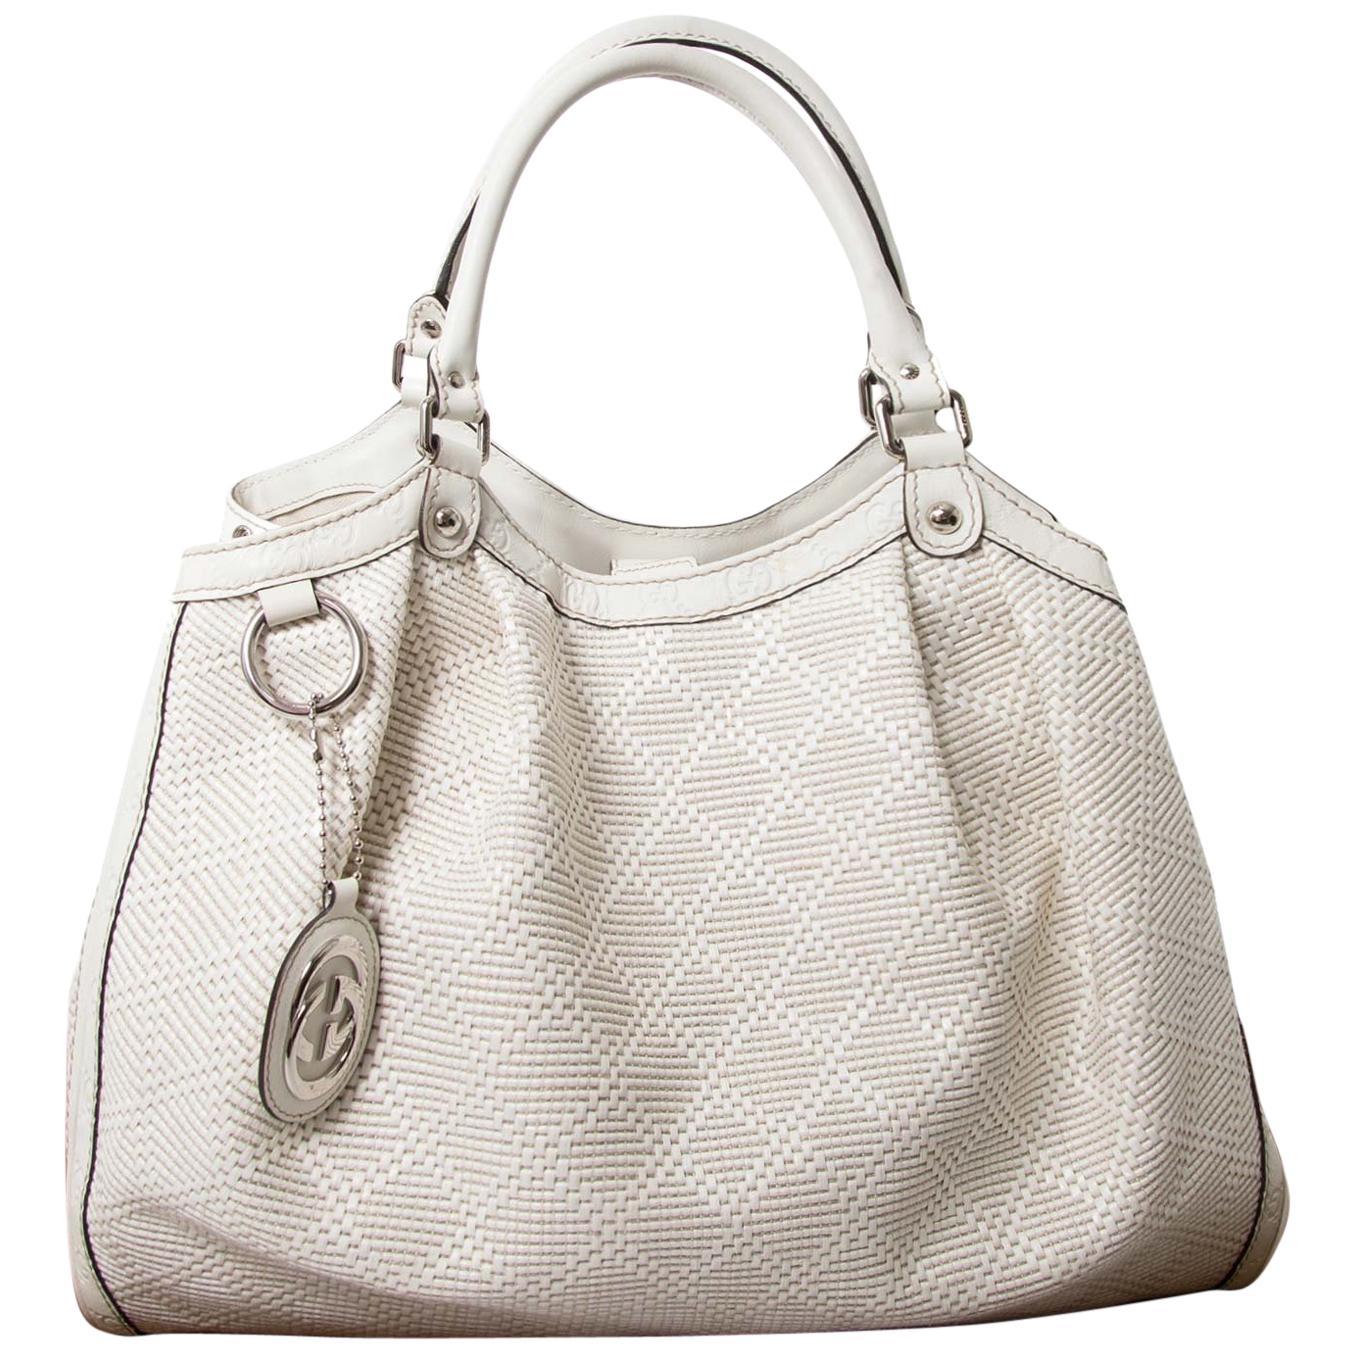 Gucci Ivory Straw 'Sukey' Bag